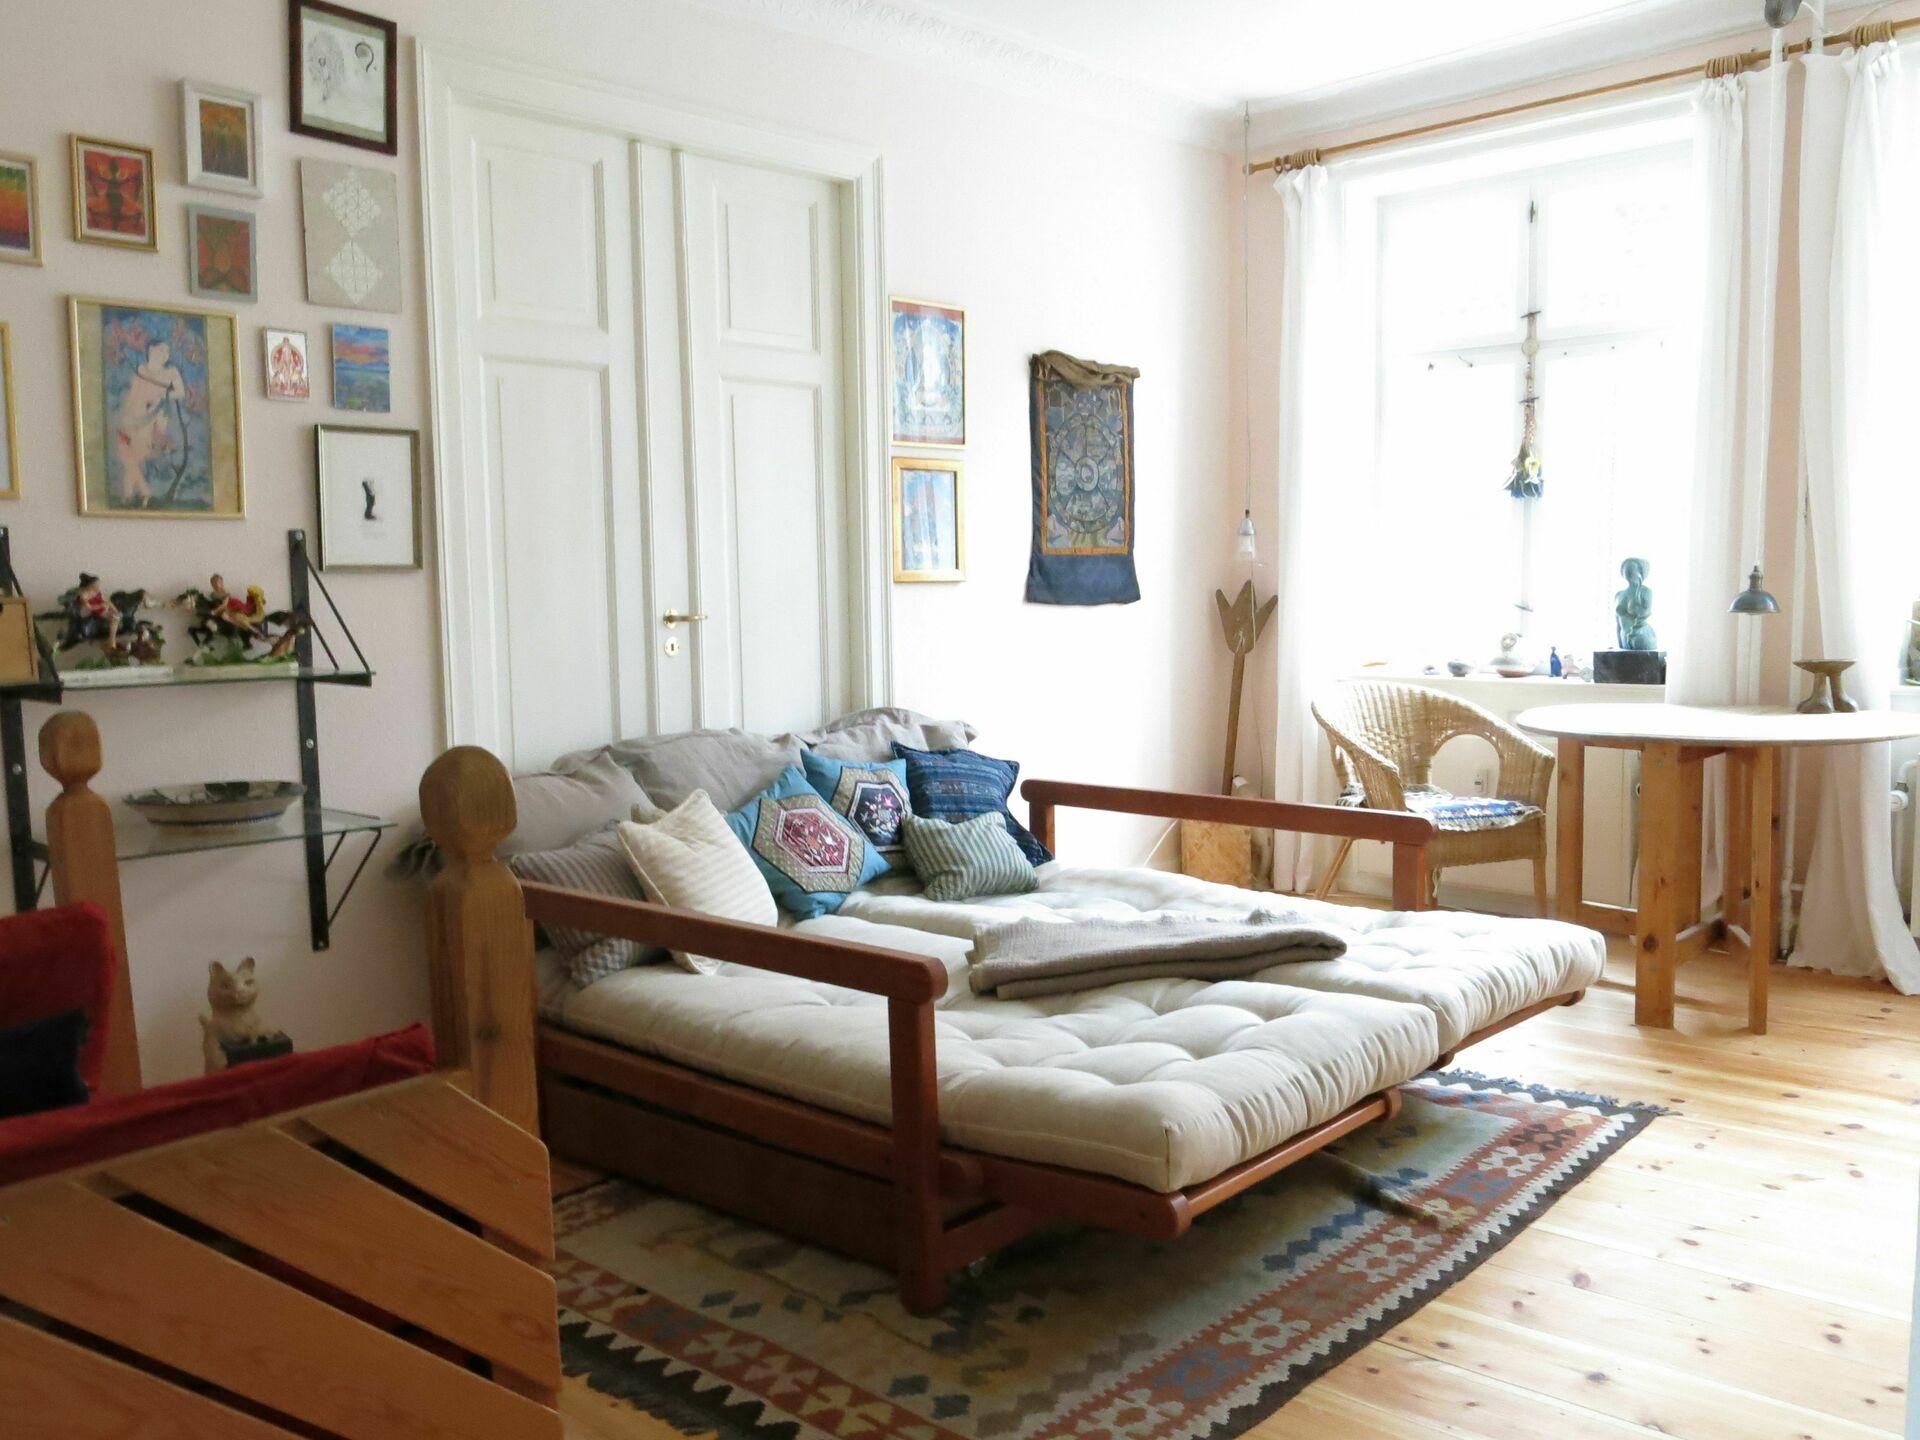 Kopenhagen Wohnung prinsessegade space for 2 wohnung in kopenhagen